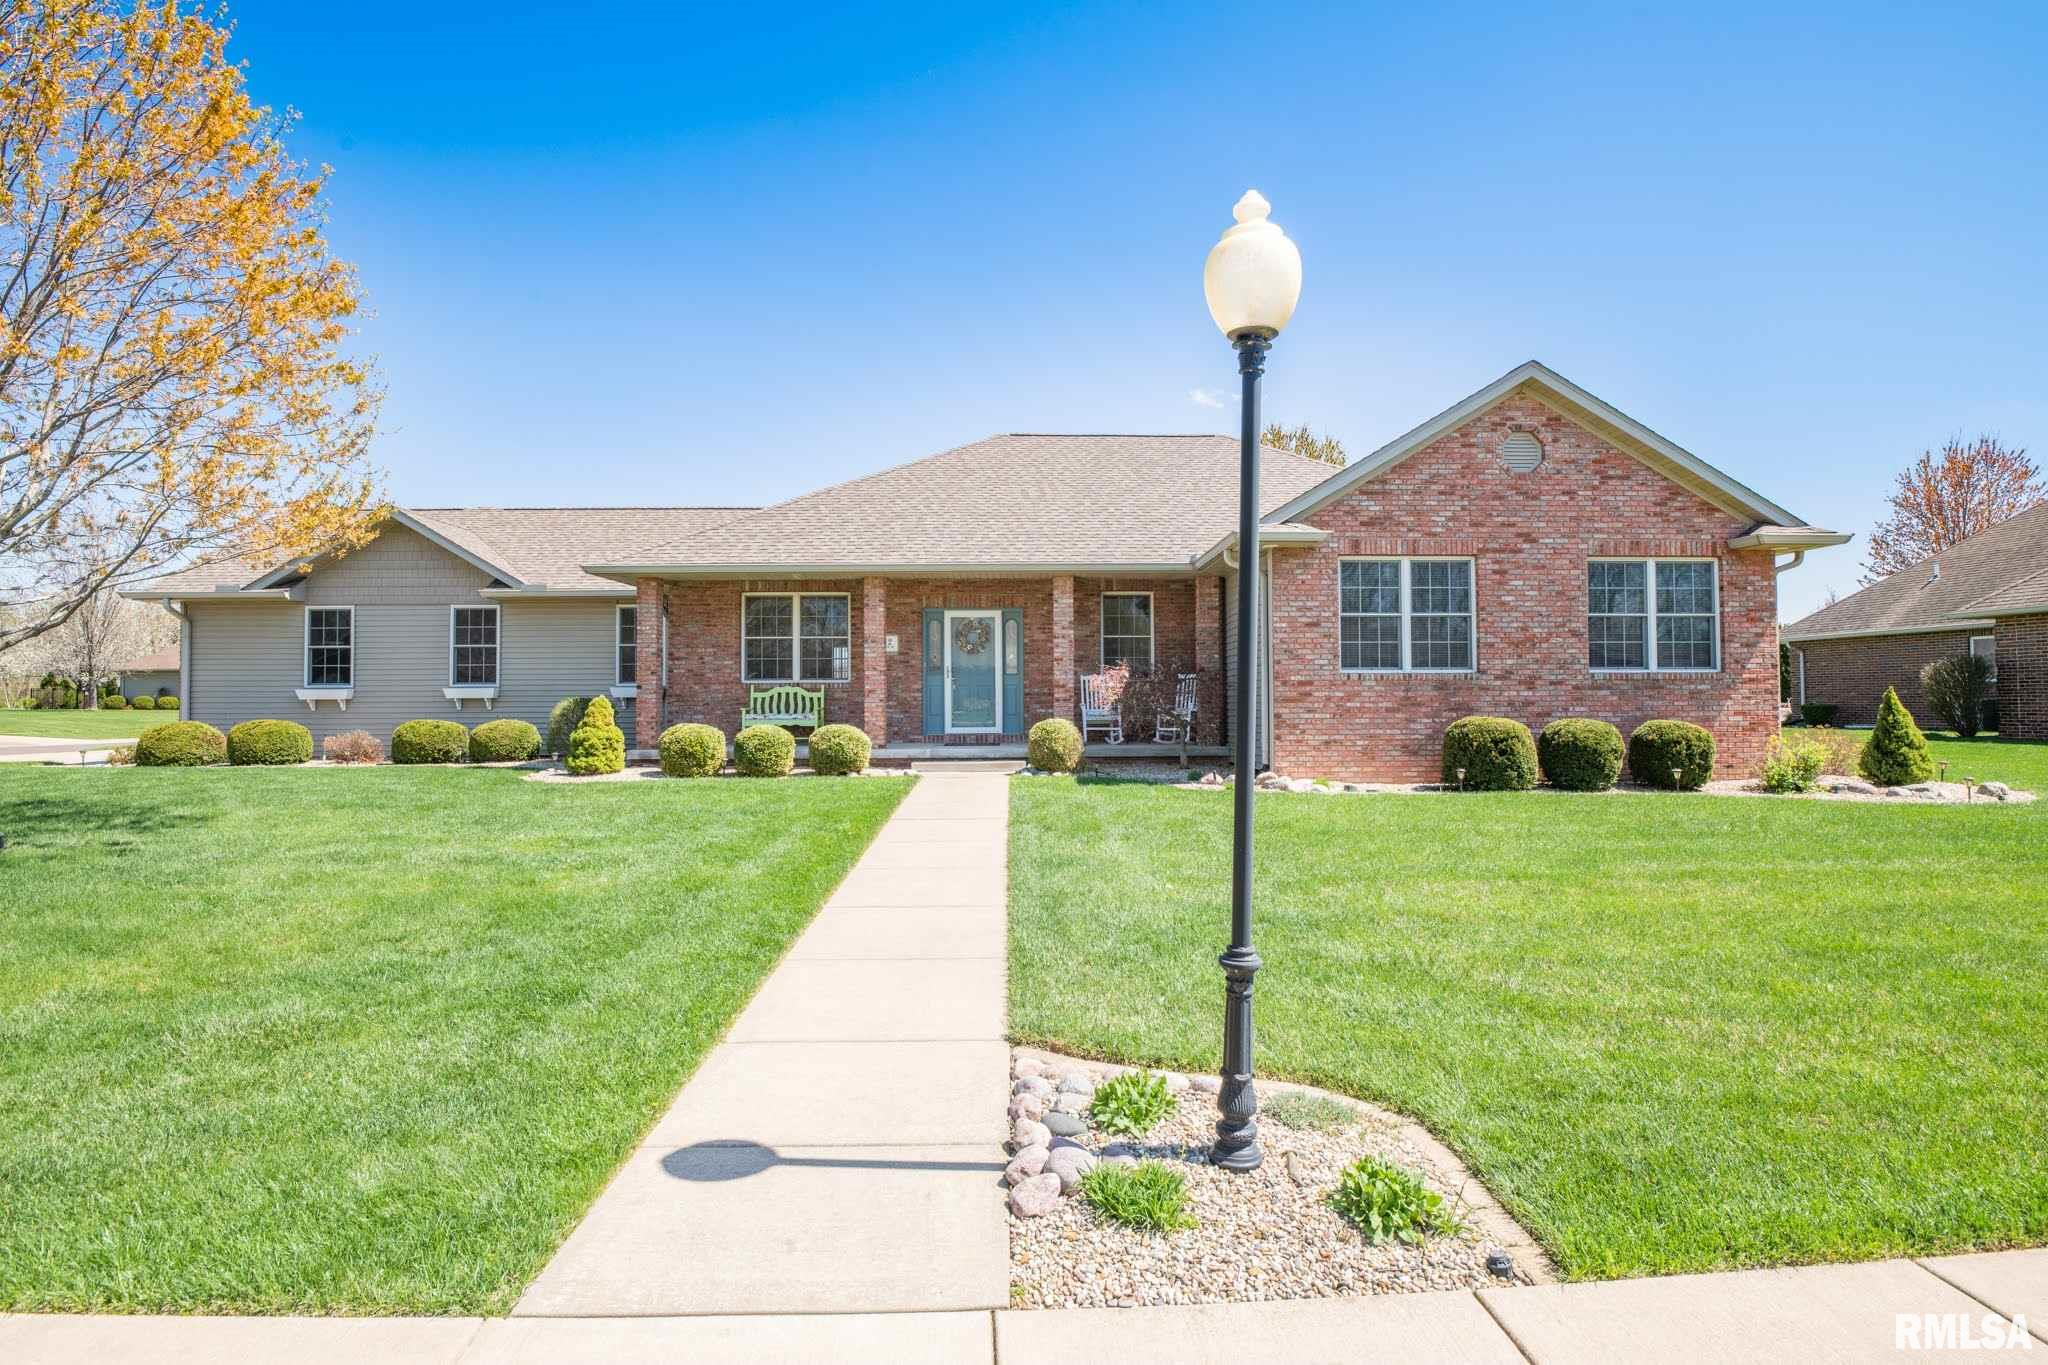 212 Ironwood Property Photo - Pekin, IL real estate listing